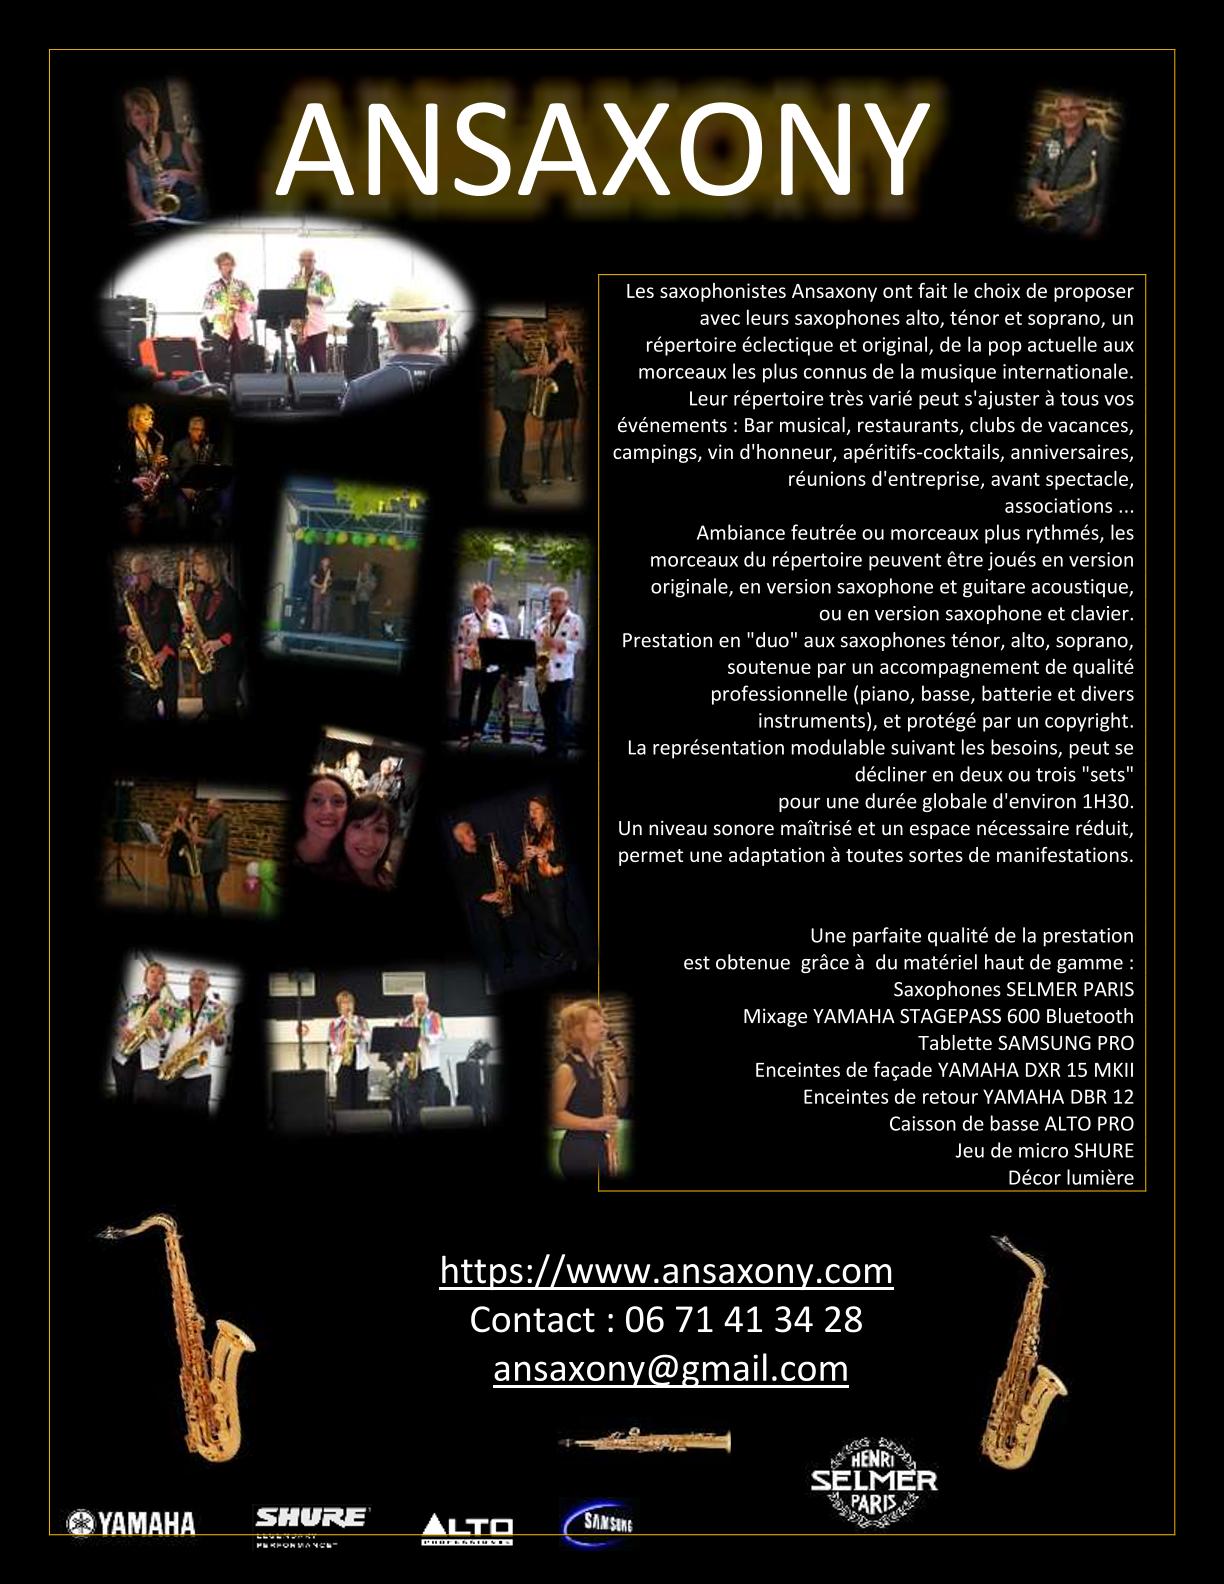 Image Ansaxony concert et animation musicale au saxophone